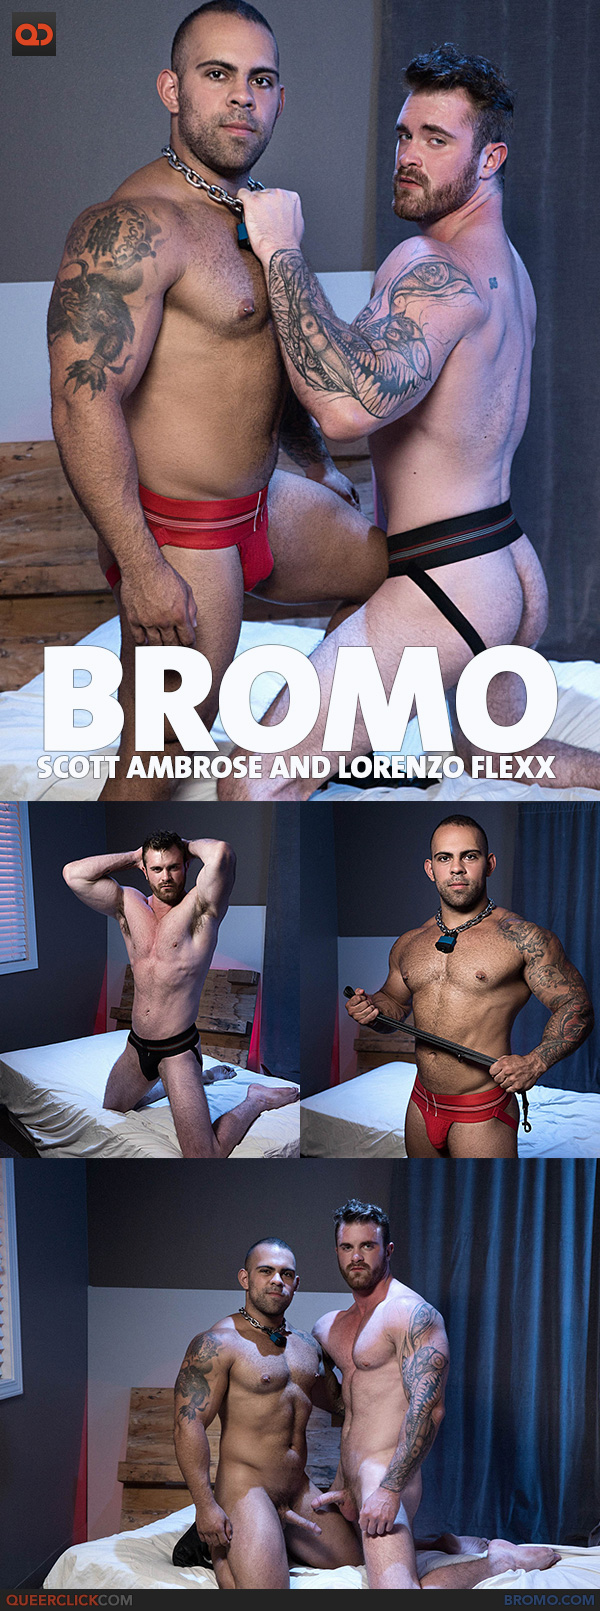 Bromo:  Scott Ambrose and Lorenzo Flexx